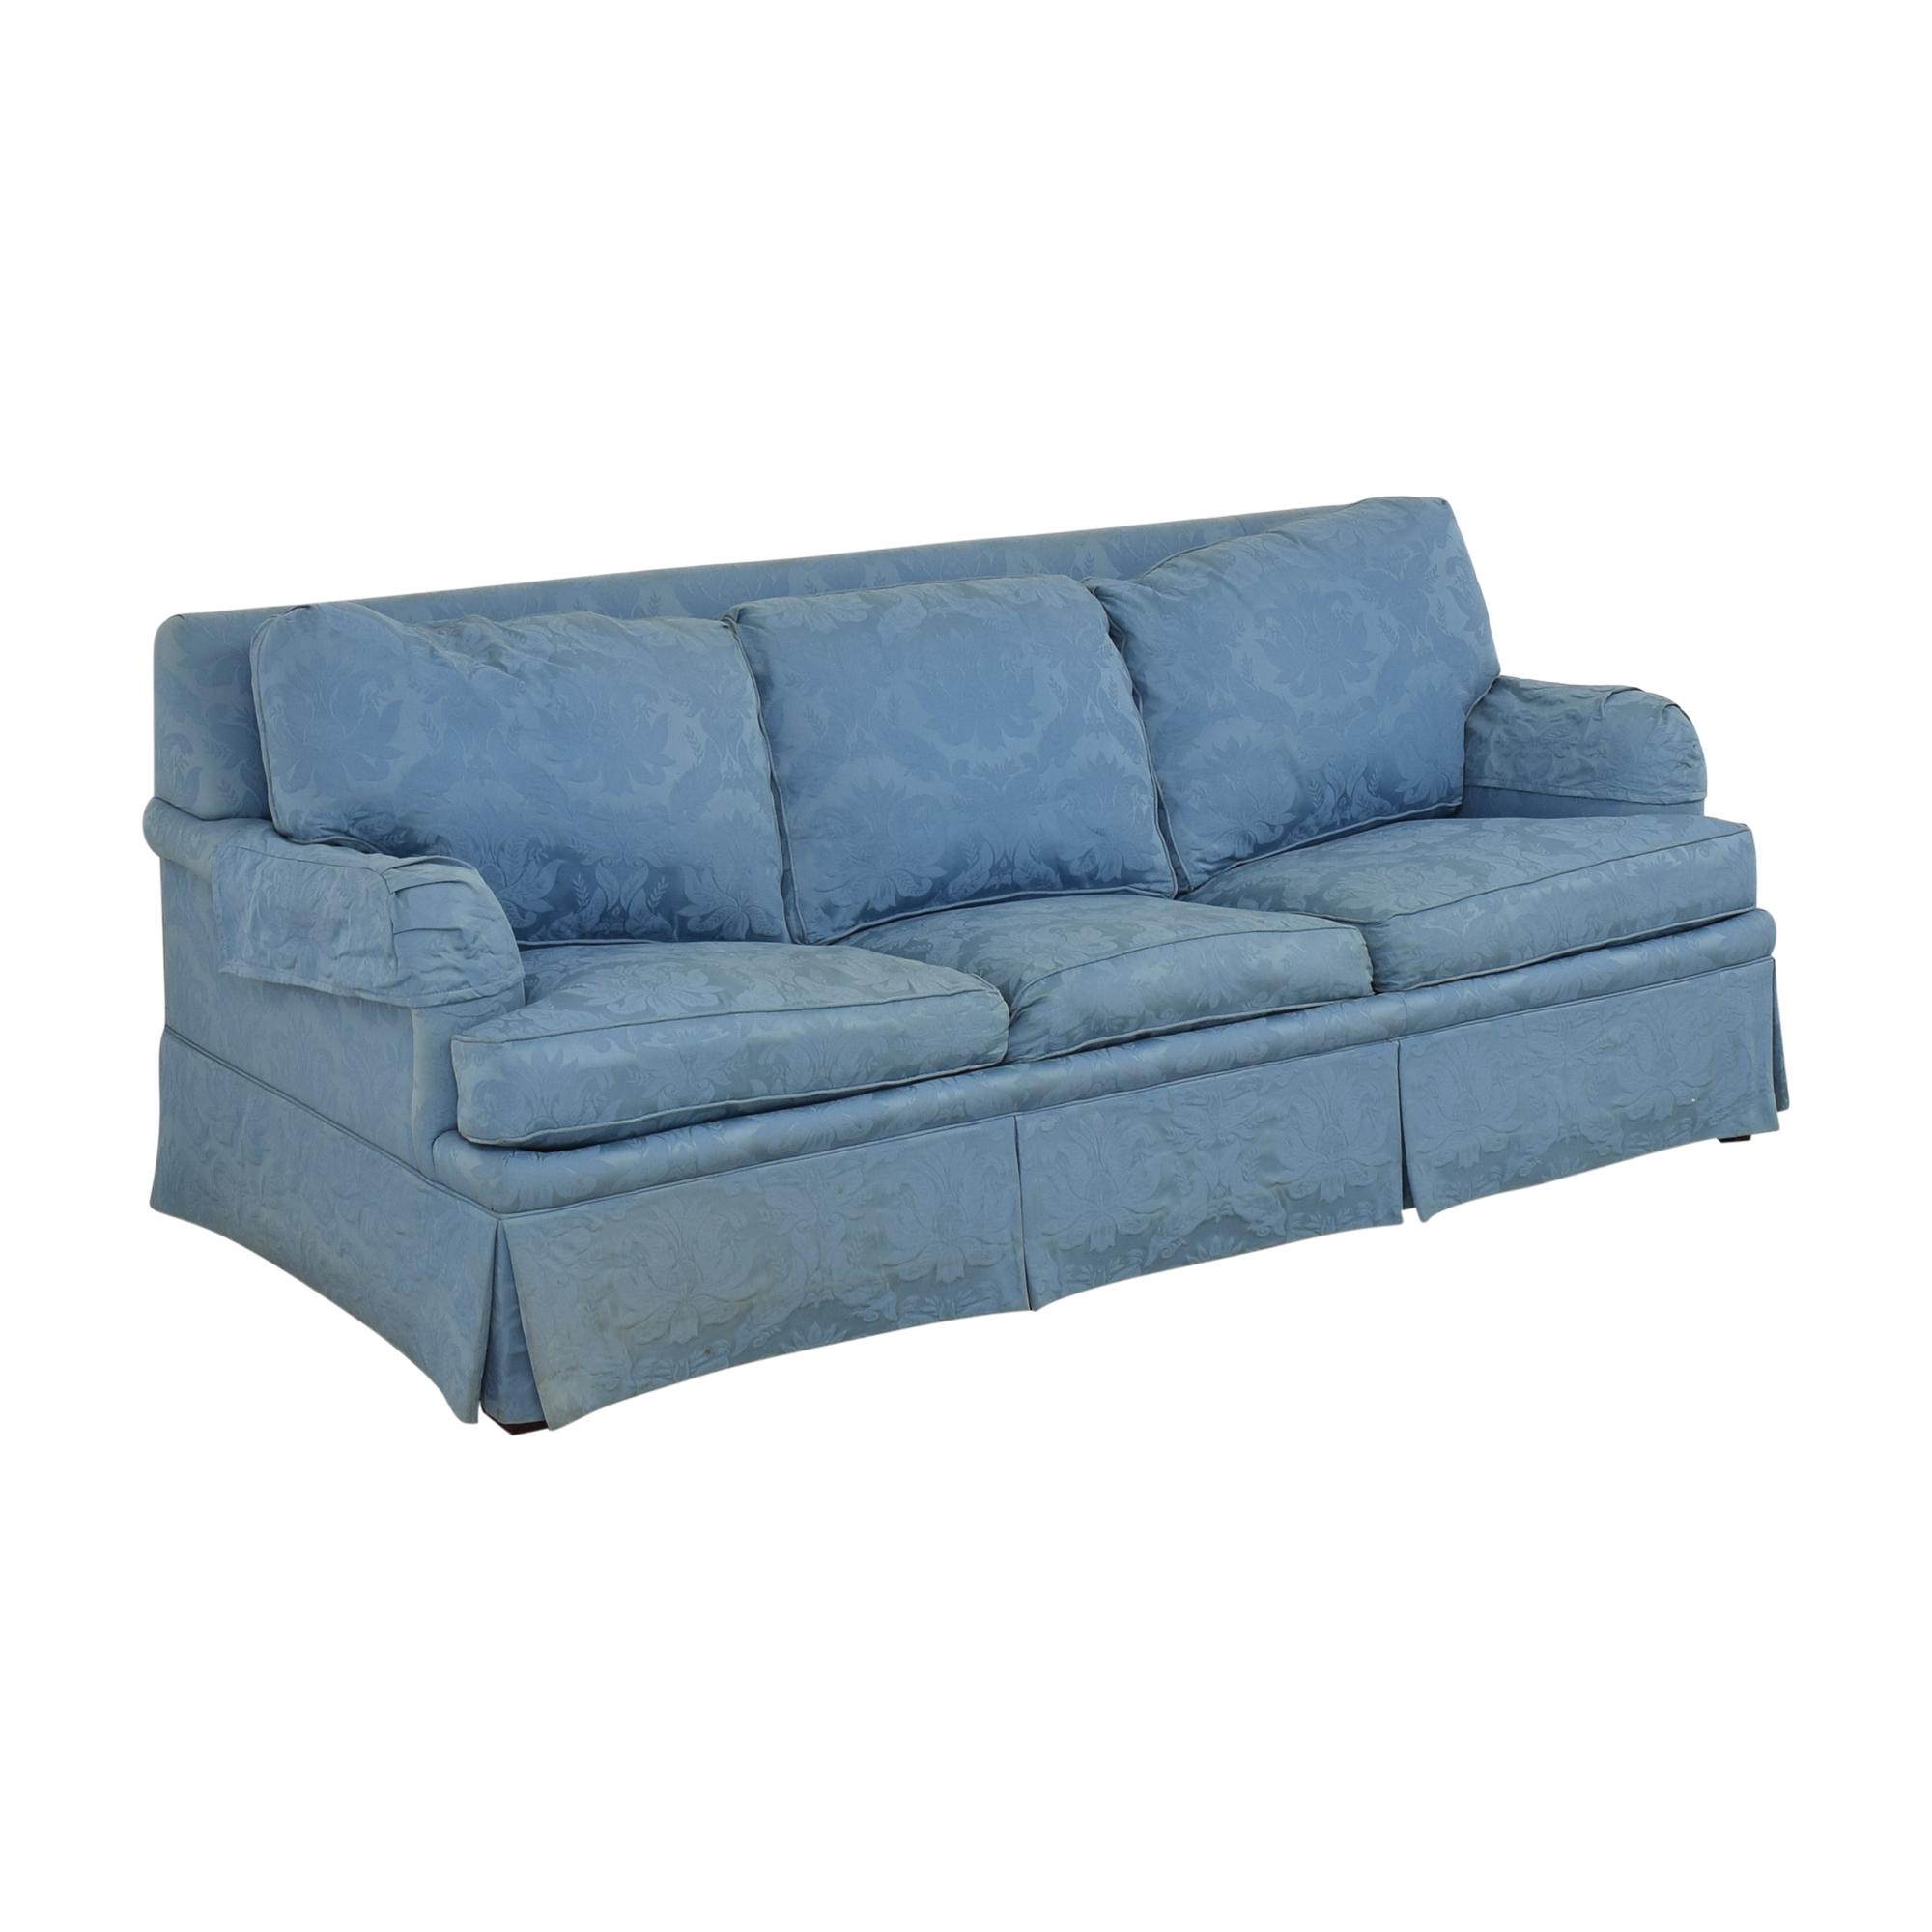 Sherrill Furniture Sherrill Furniture Damask Sleeper Sofa